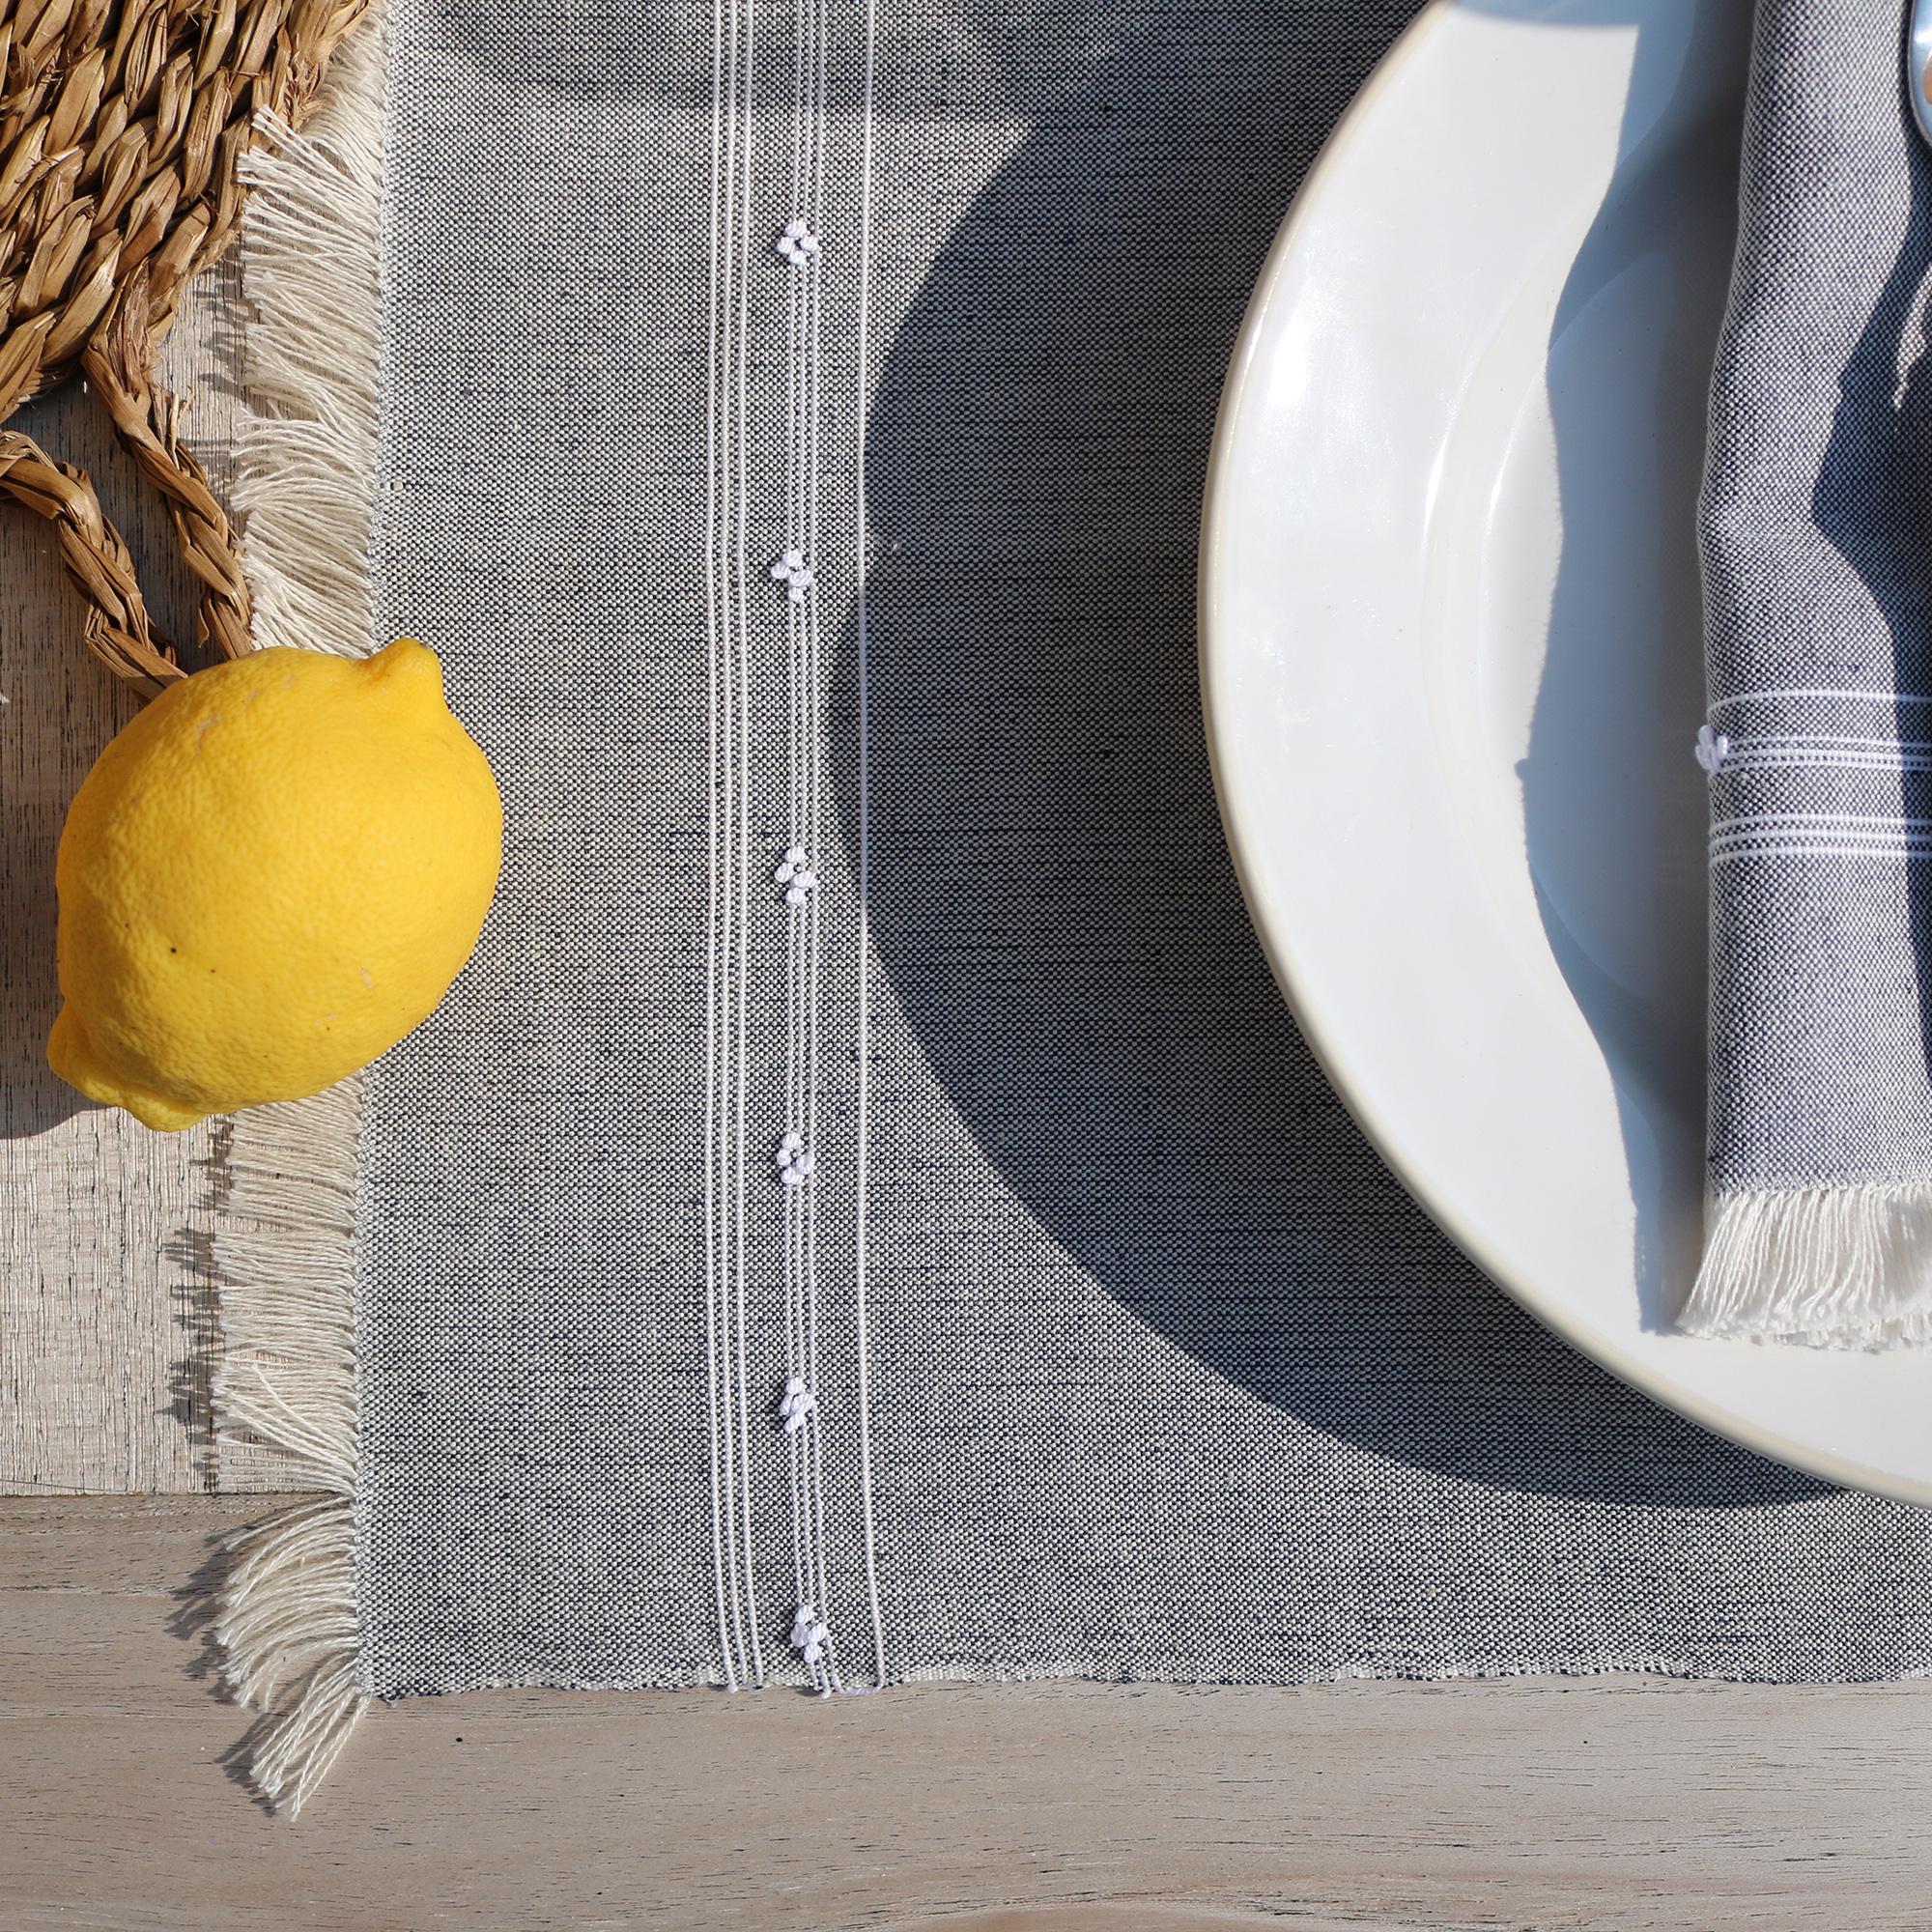 LUSITANO STUDIO's Handwoven Linen Vila Real Placemats